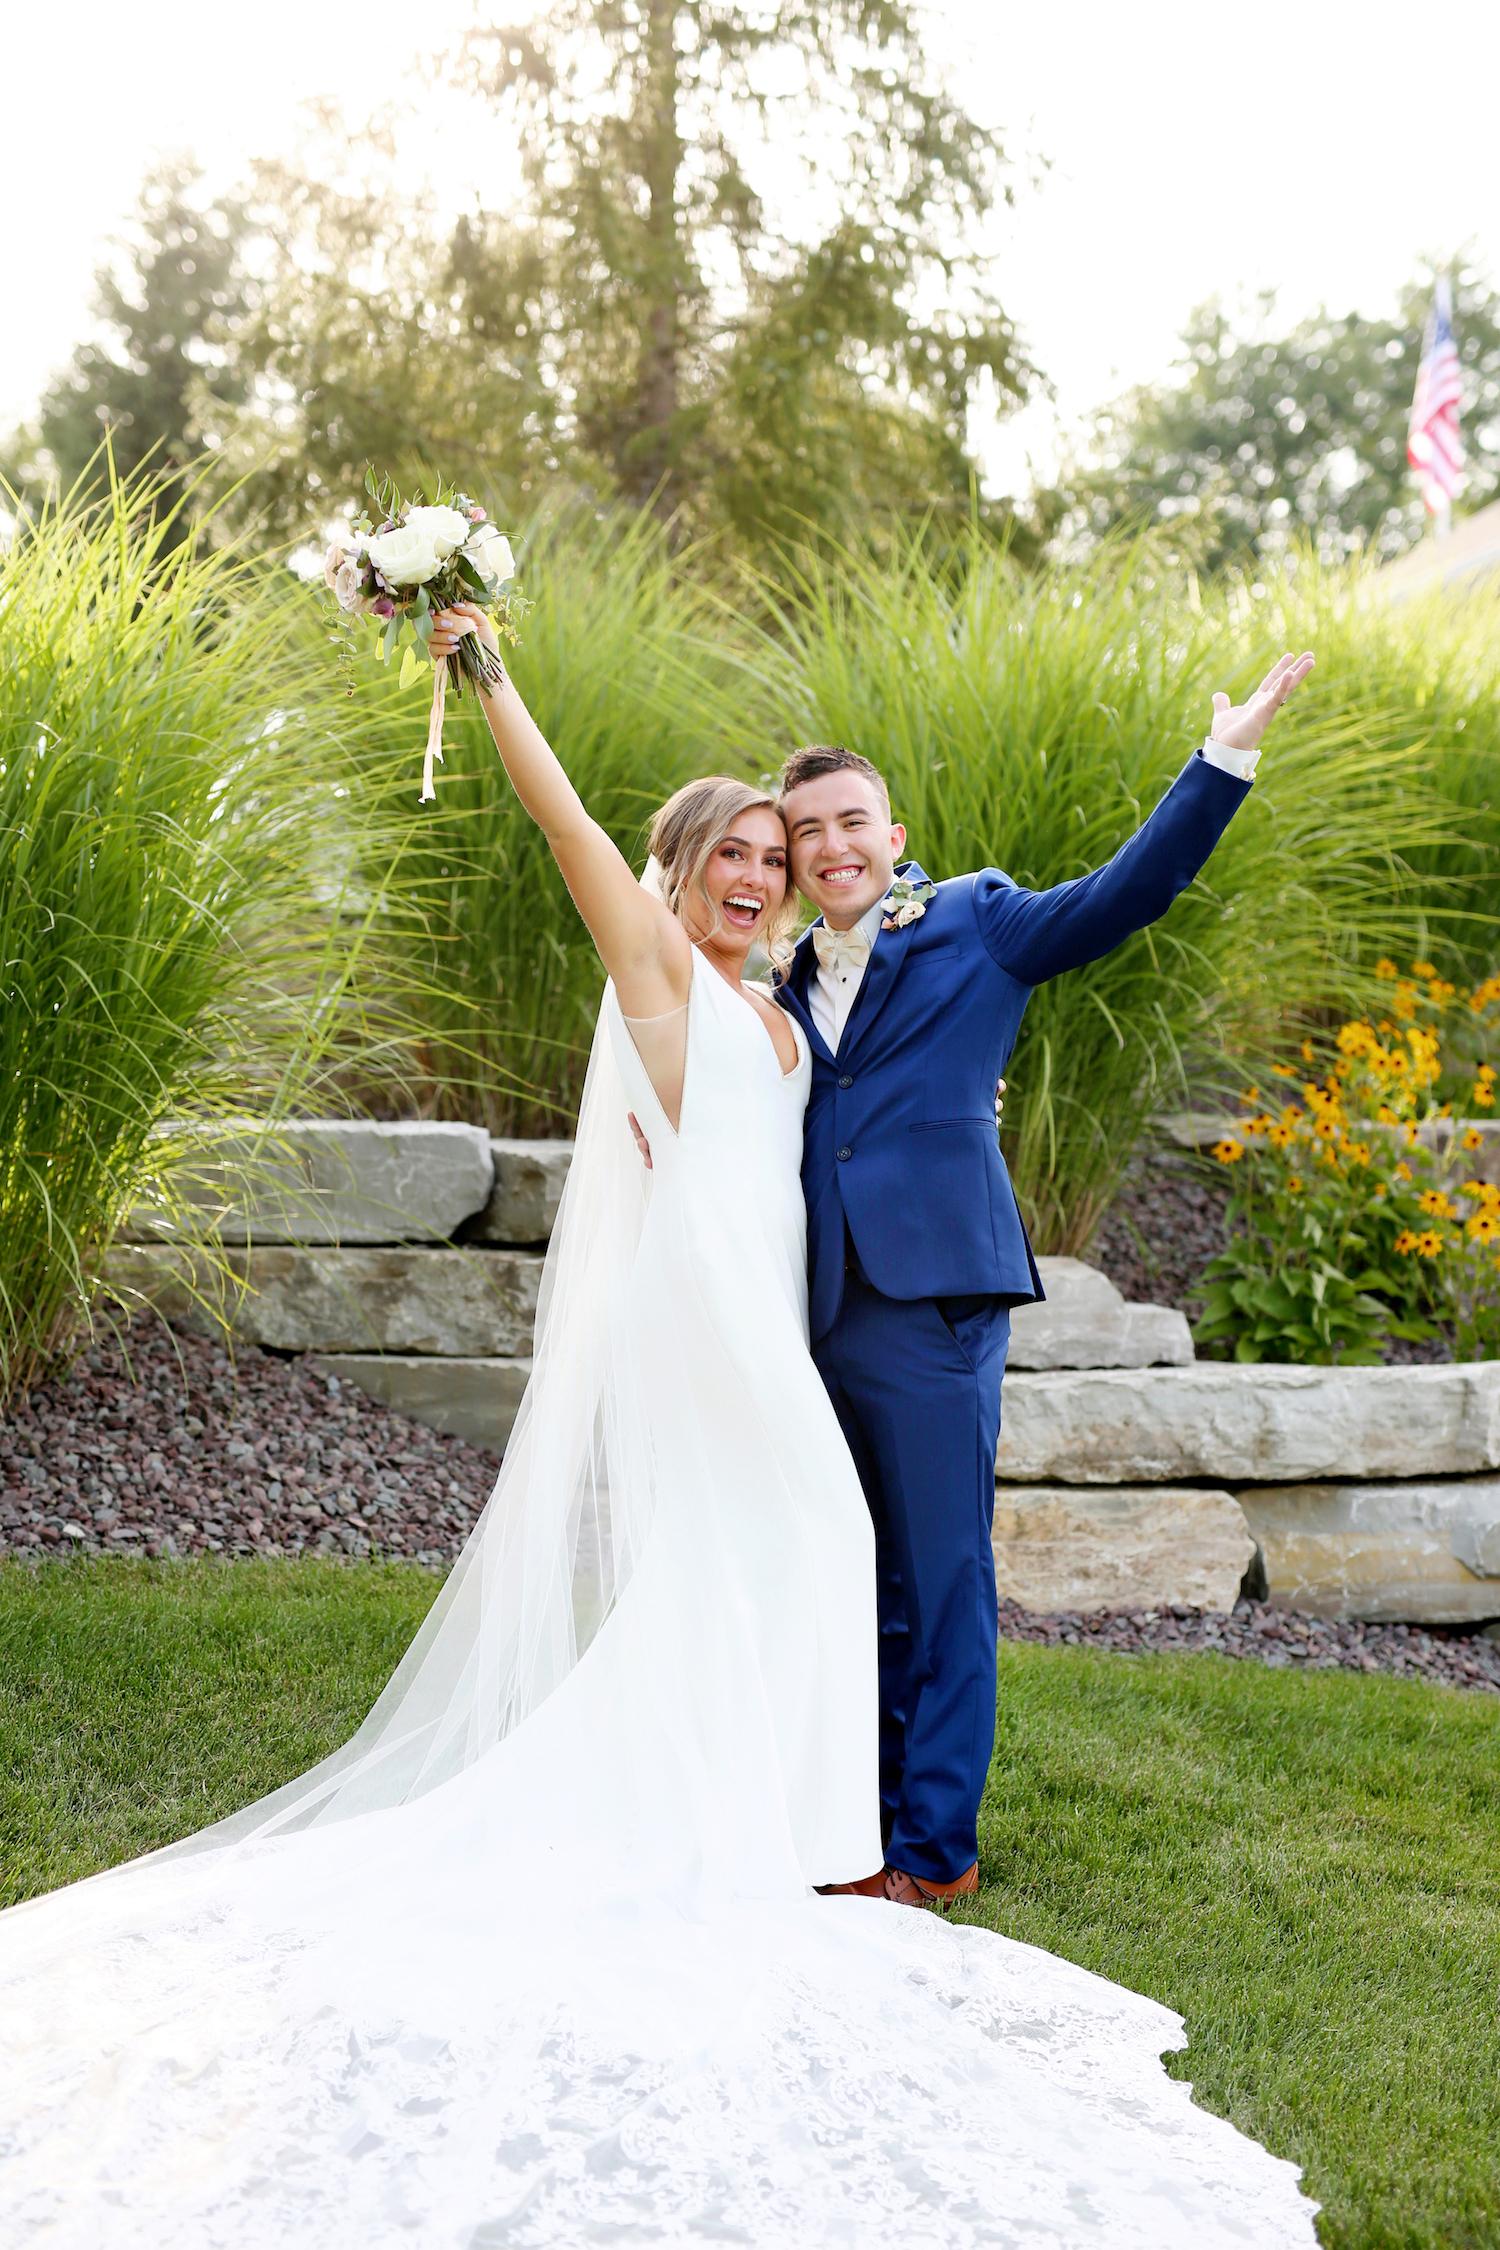 Bide and groom celebrating at kalamazoo Michigan wedding